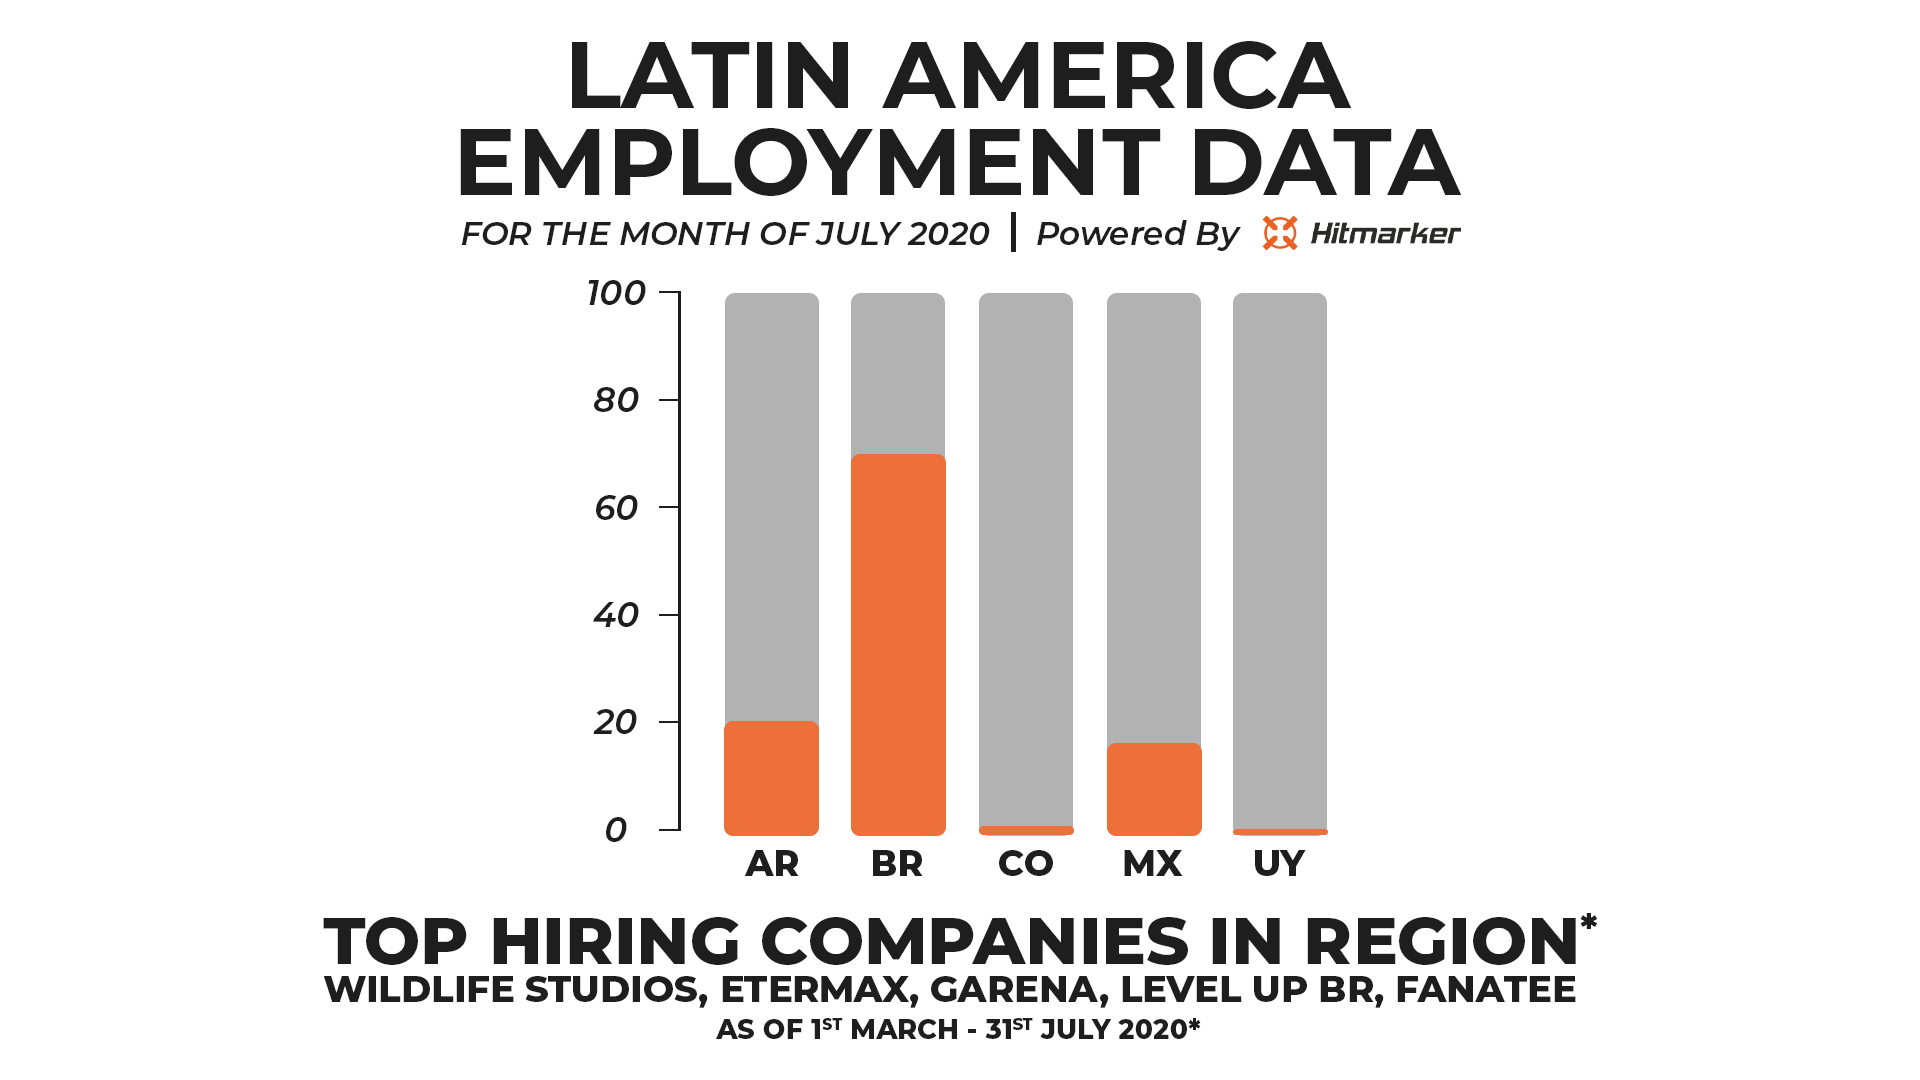 Hitmarker Employment Data Latin America